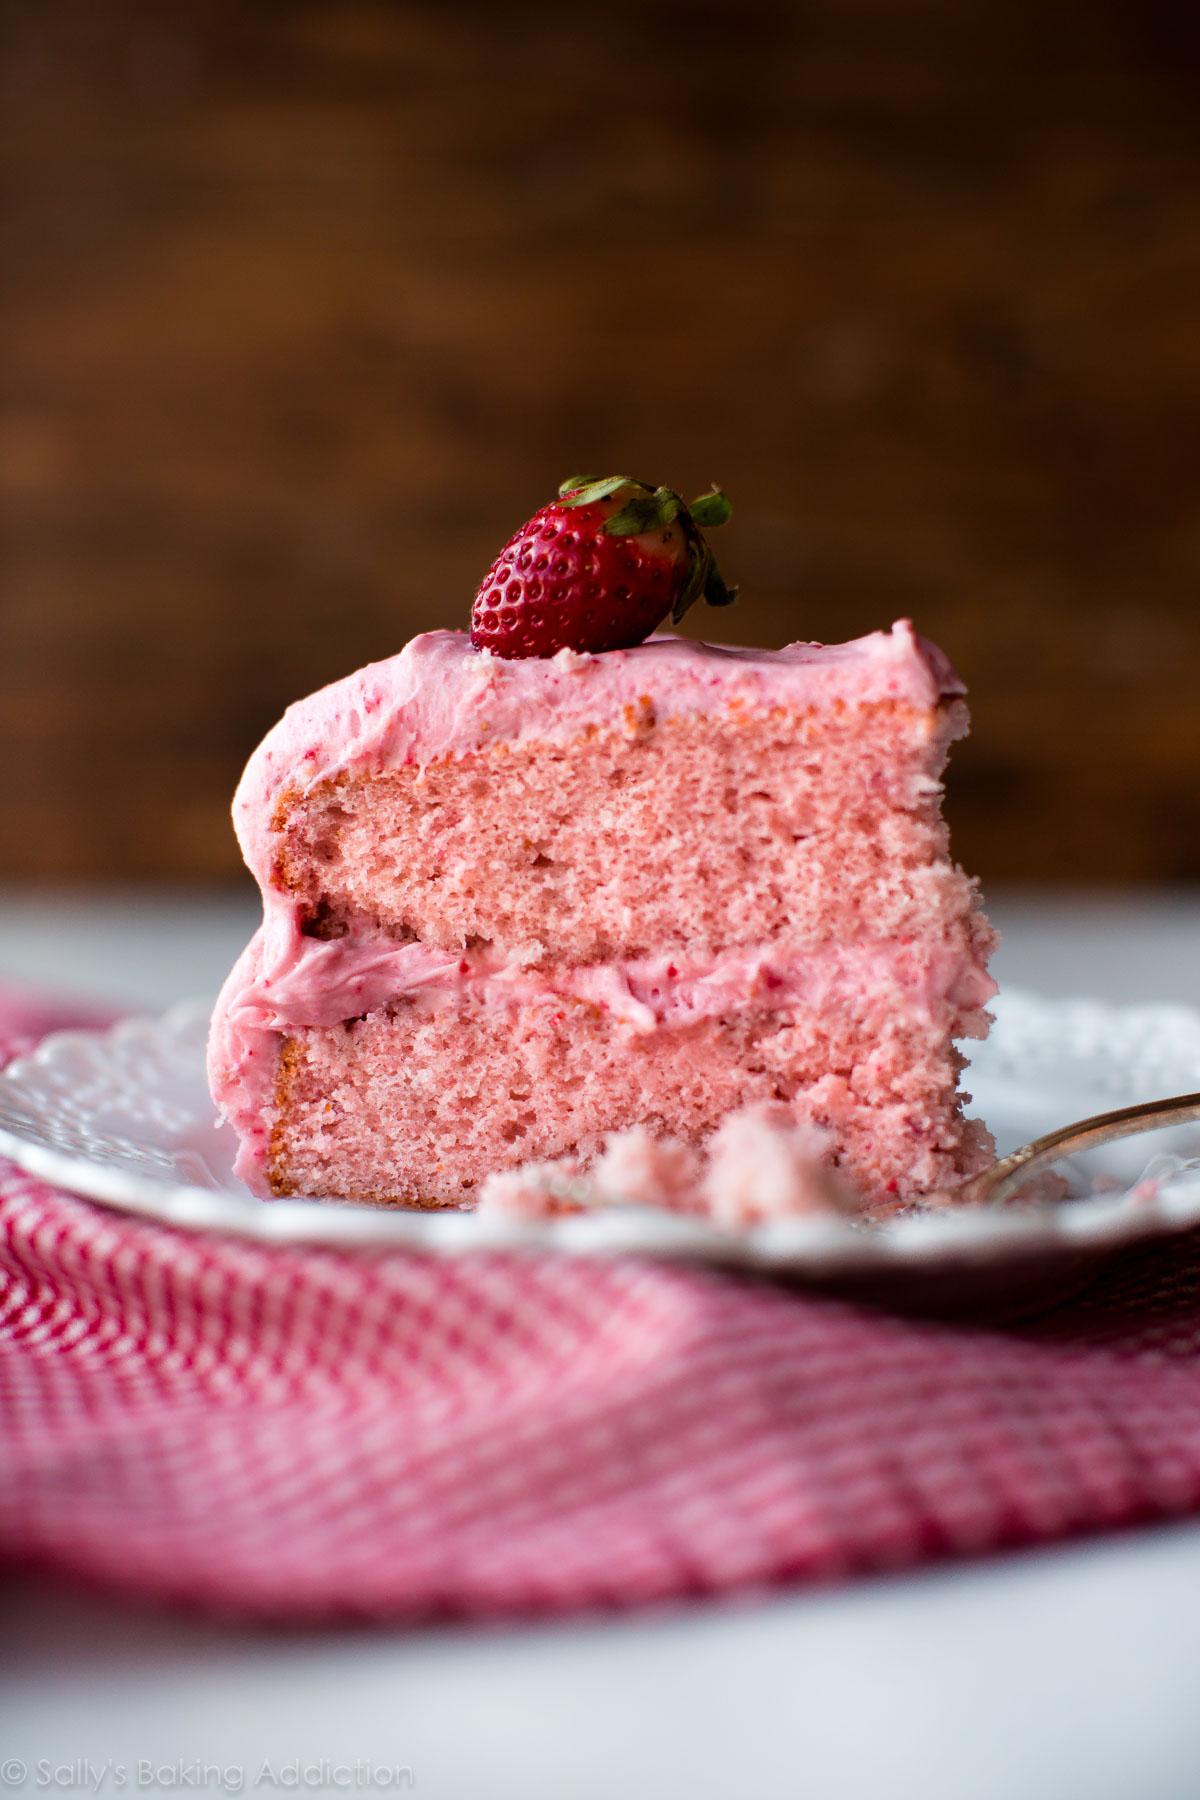 Homemade Strawberry Cake - Sallys Baking Addiction